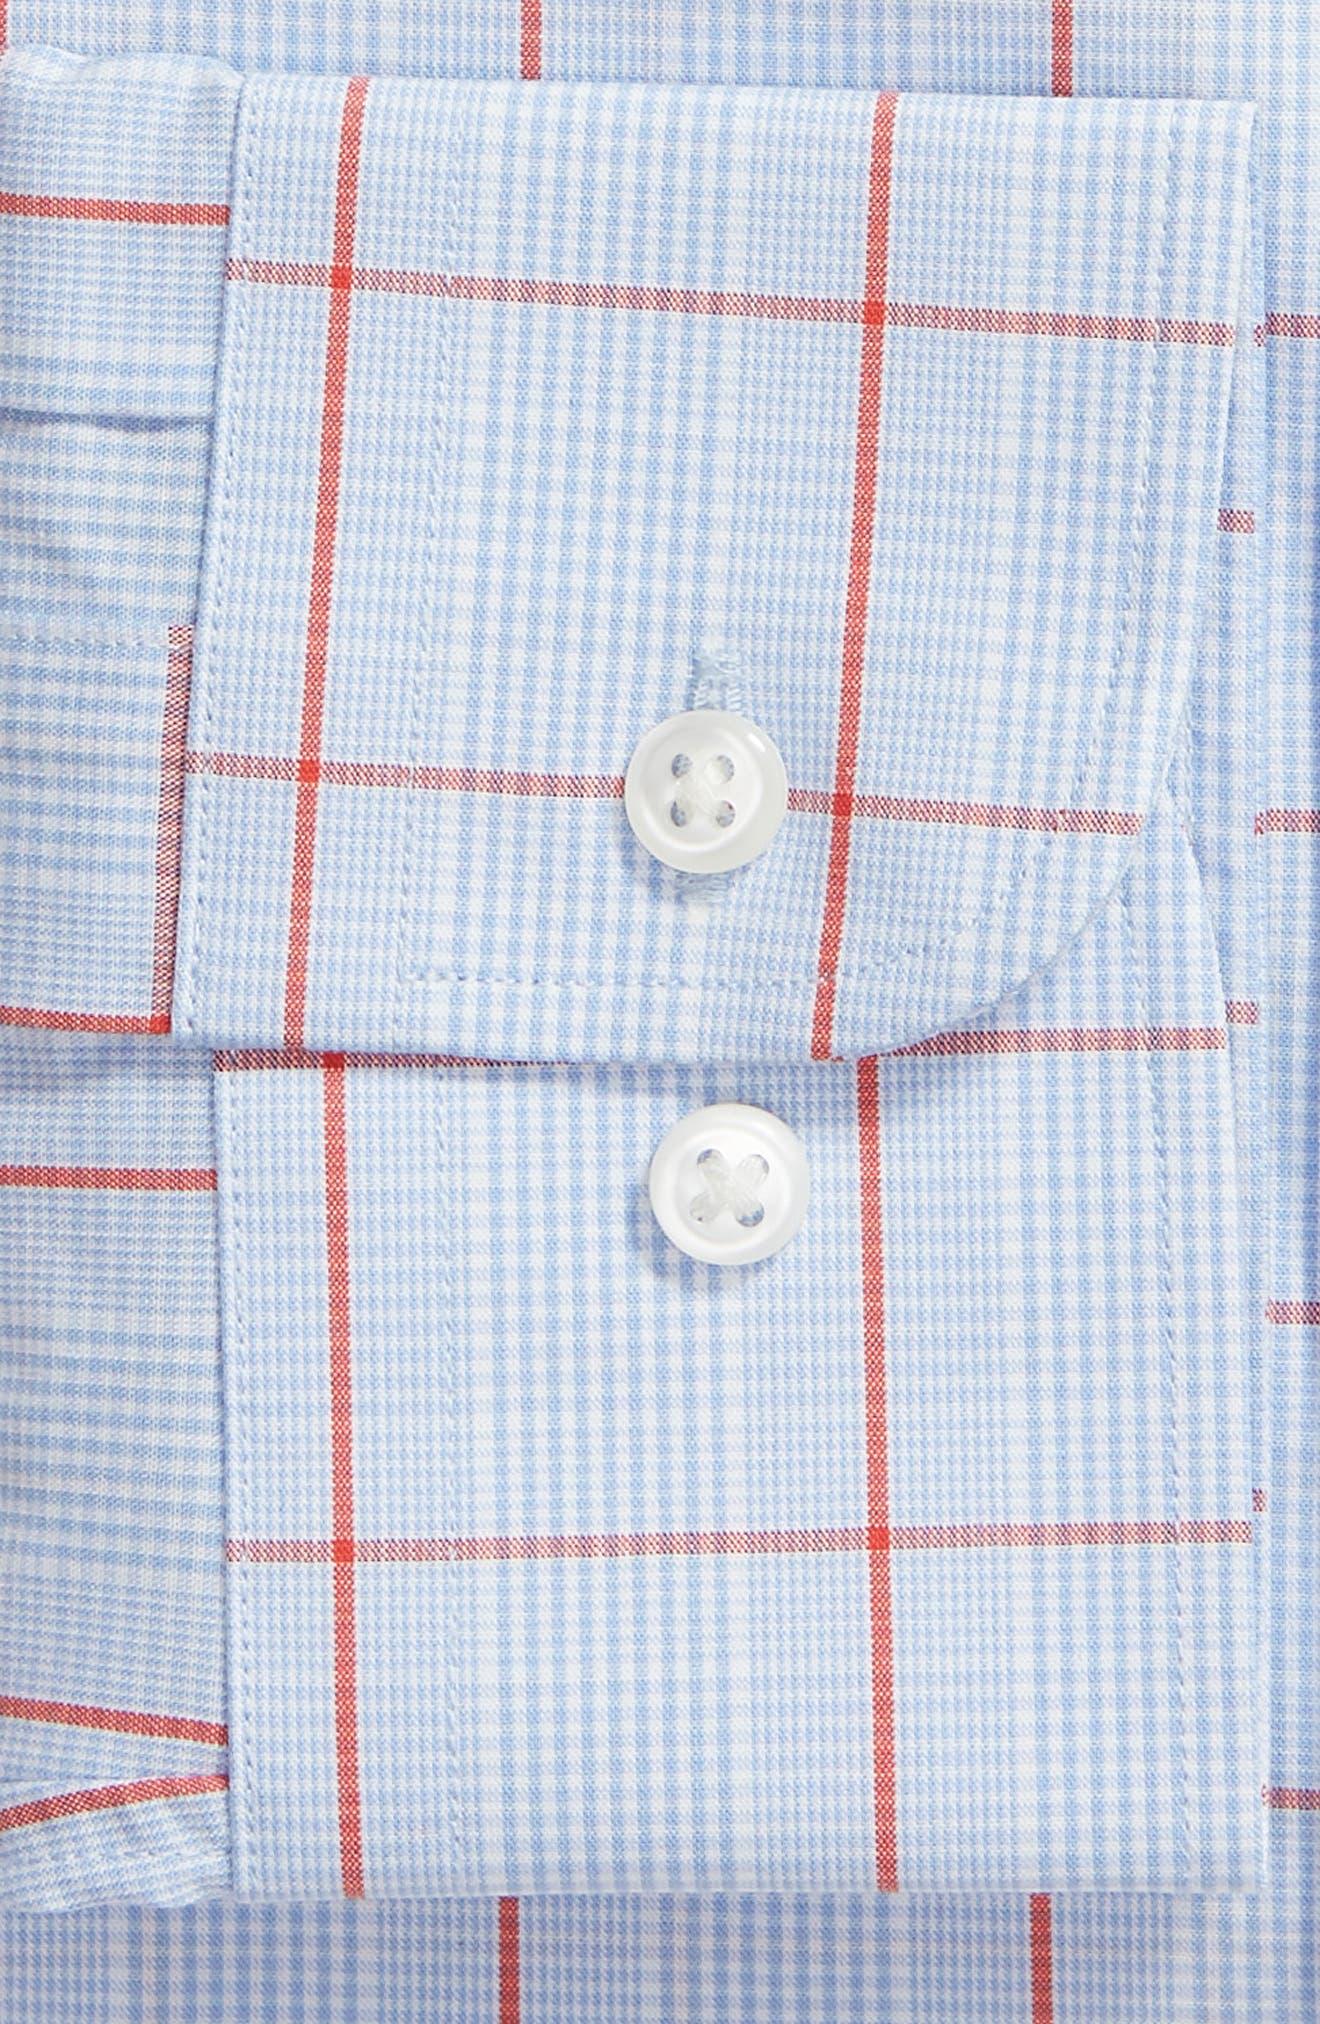 Tech-Smart Trim Fit Stretch Check Dress Shirt,                             Alternate thumbnail 6, color,                             RED SAUCY